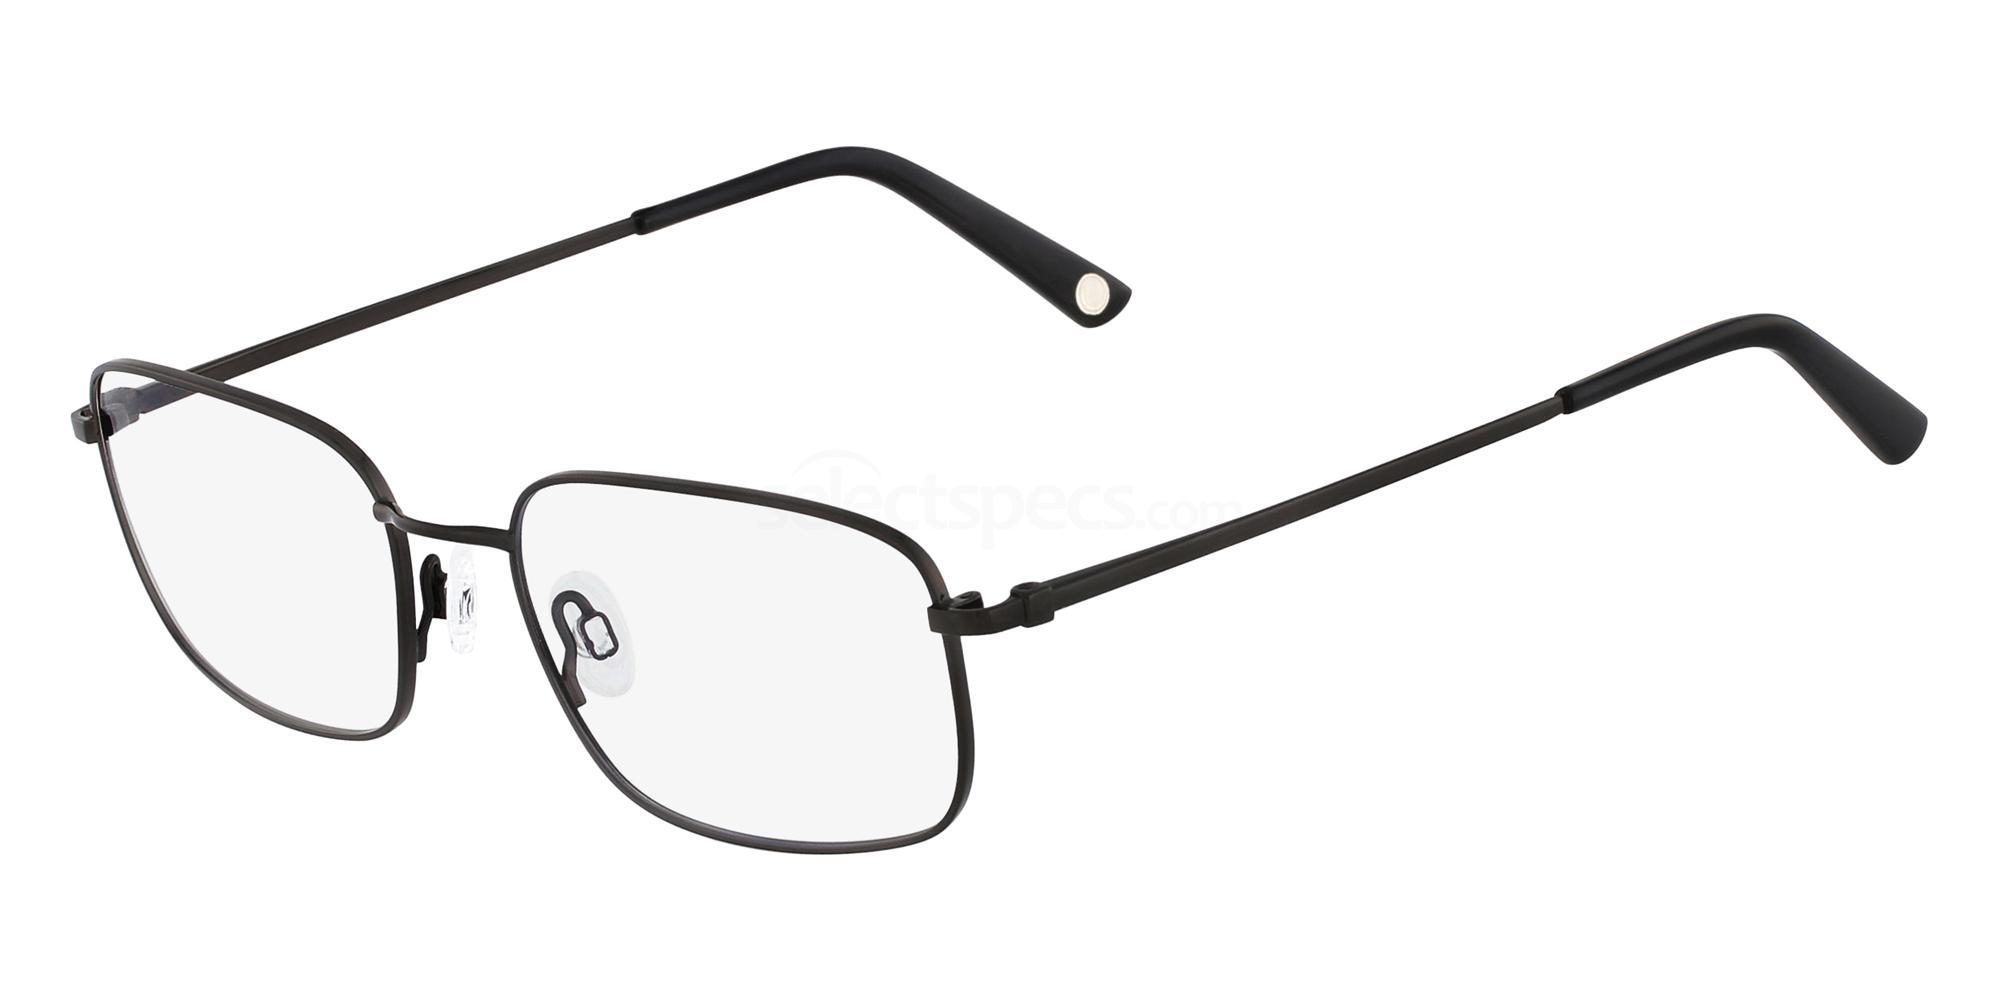 001 FLEXON BENJAMIN 600 Glasses, Flexon